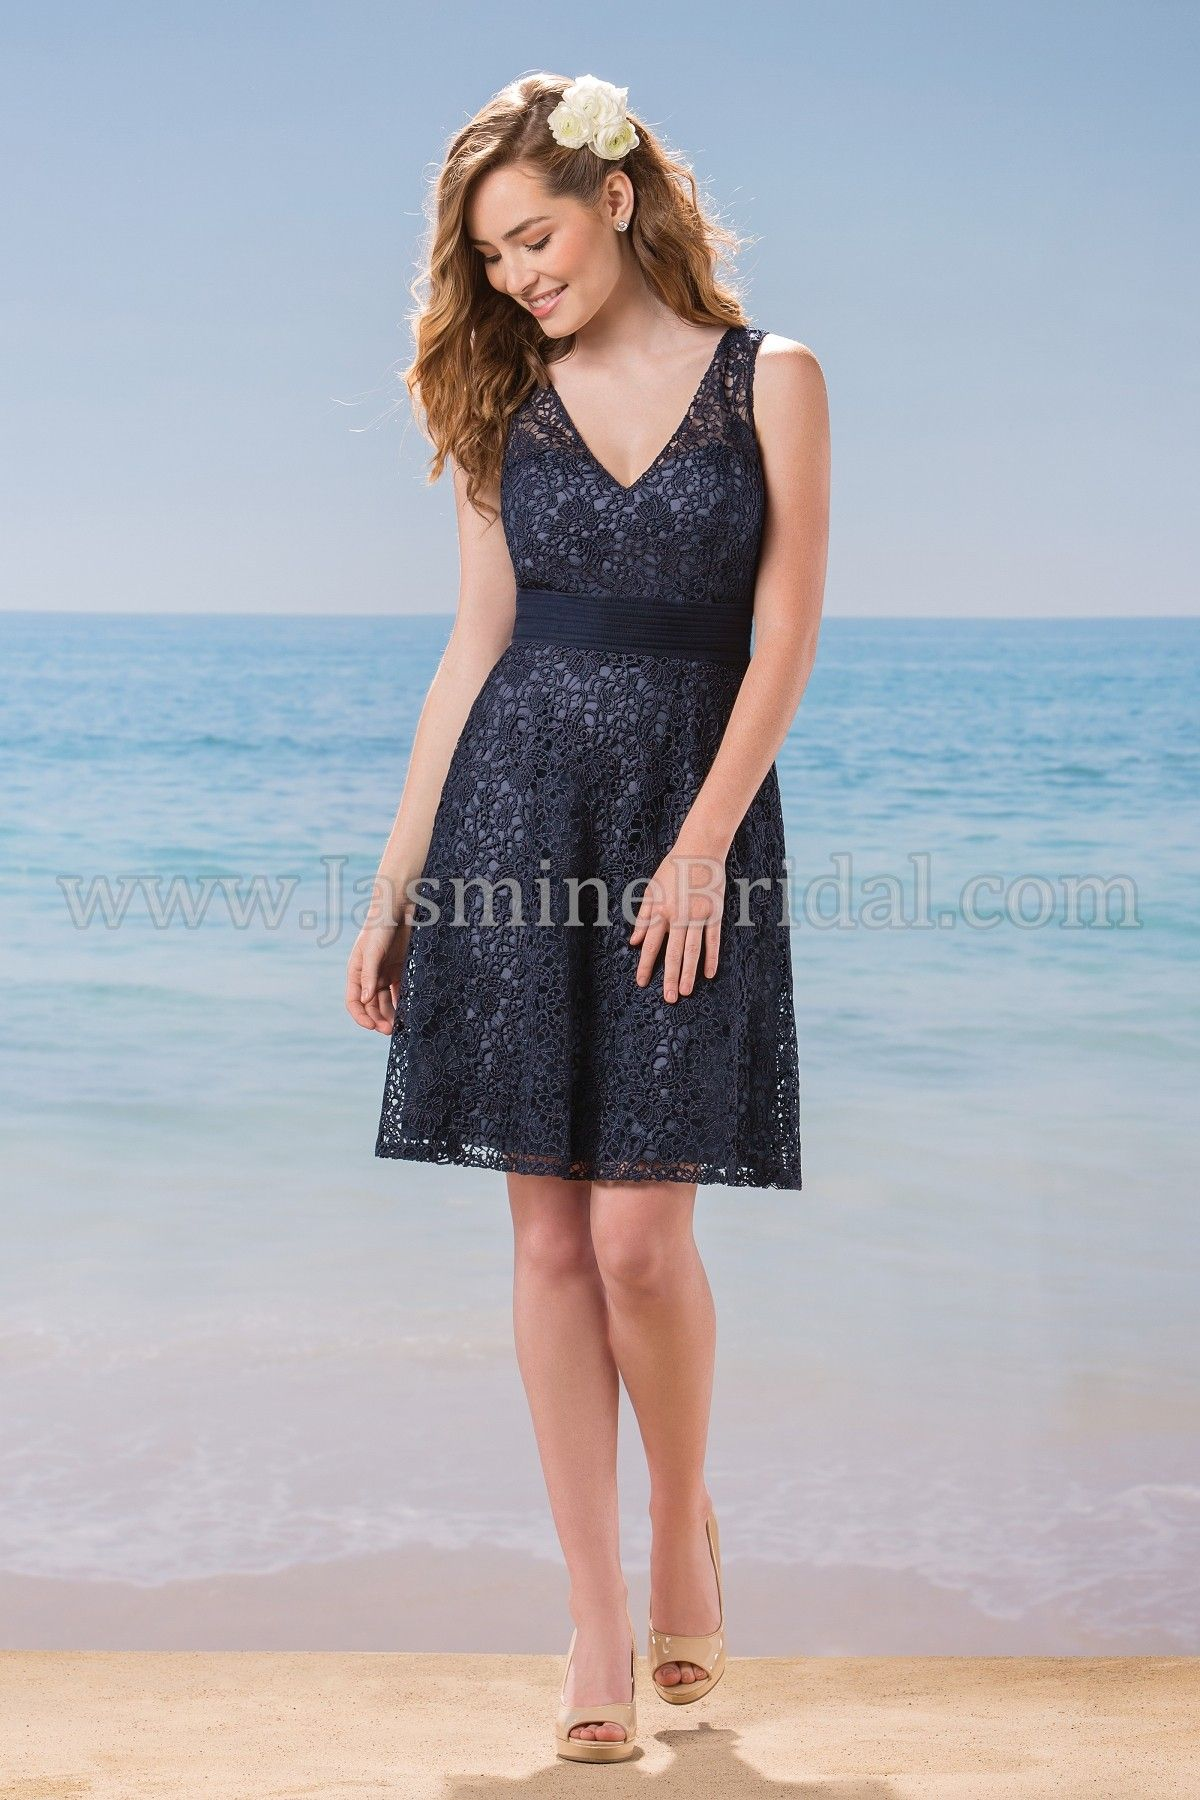 7d384c13868f Jasmine Bridal Bridesmaid Dress Belsoie Style L184019 in Navy ...